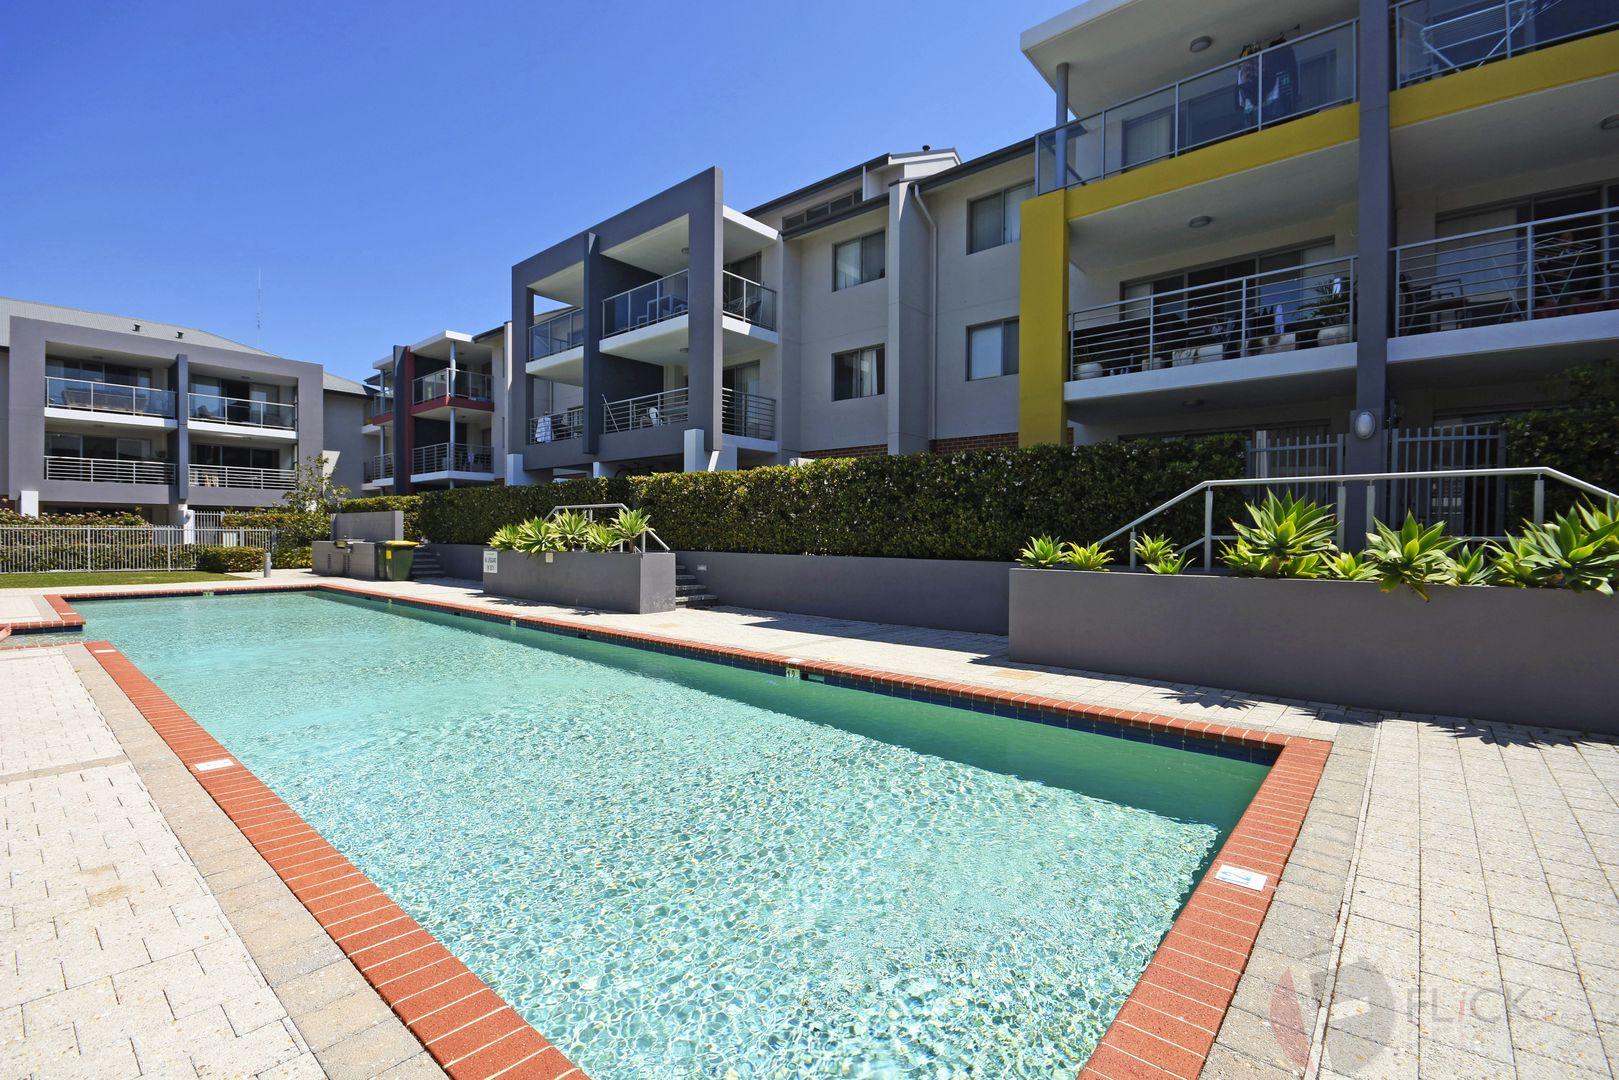 47/19 Carr Street, West Perth WA 6005, Image 0